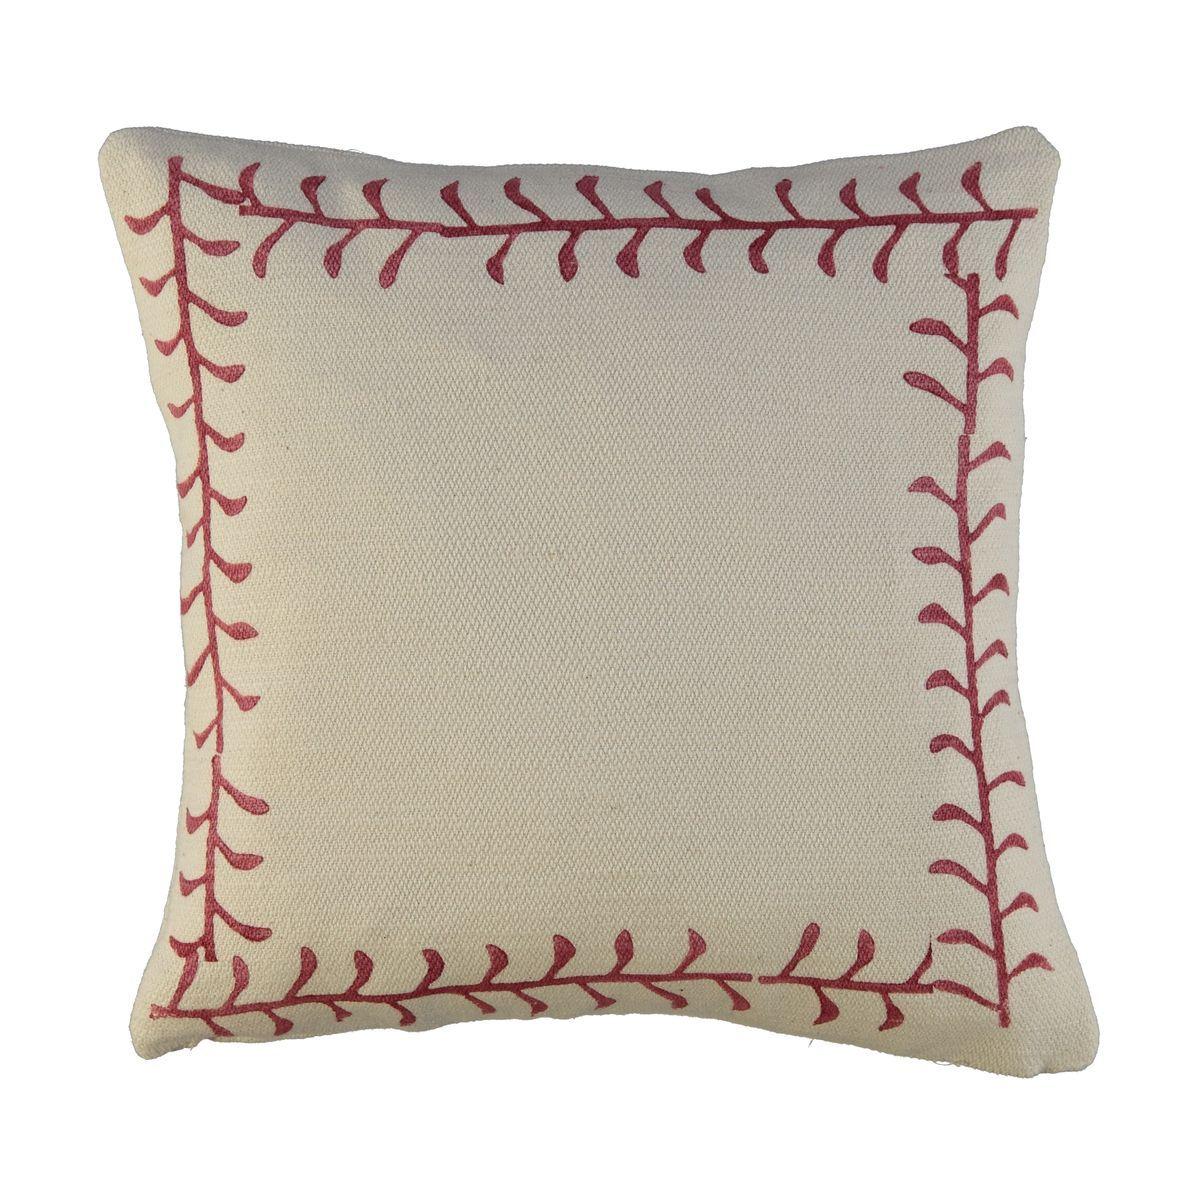 Cushion Cover / 16 Hand Printed - Bordeaux